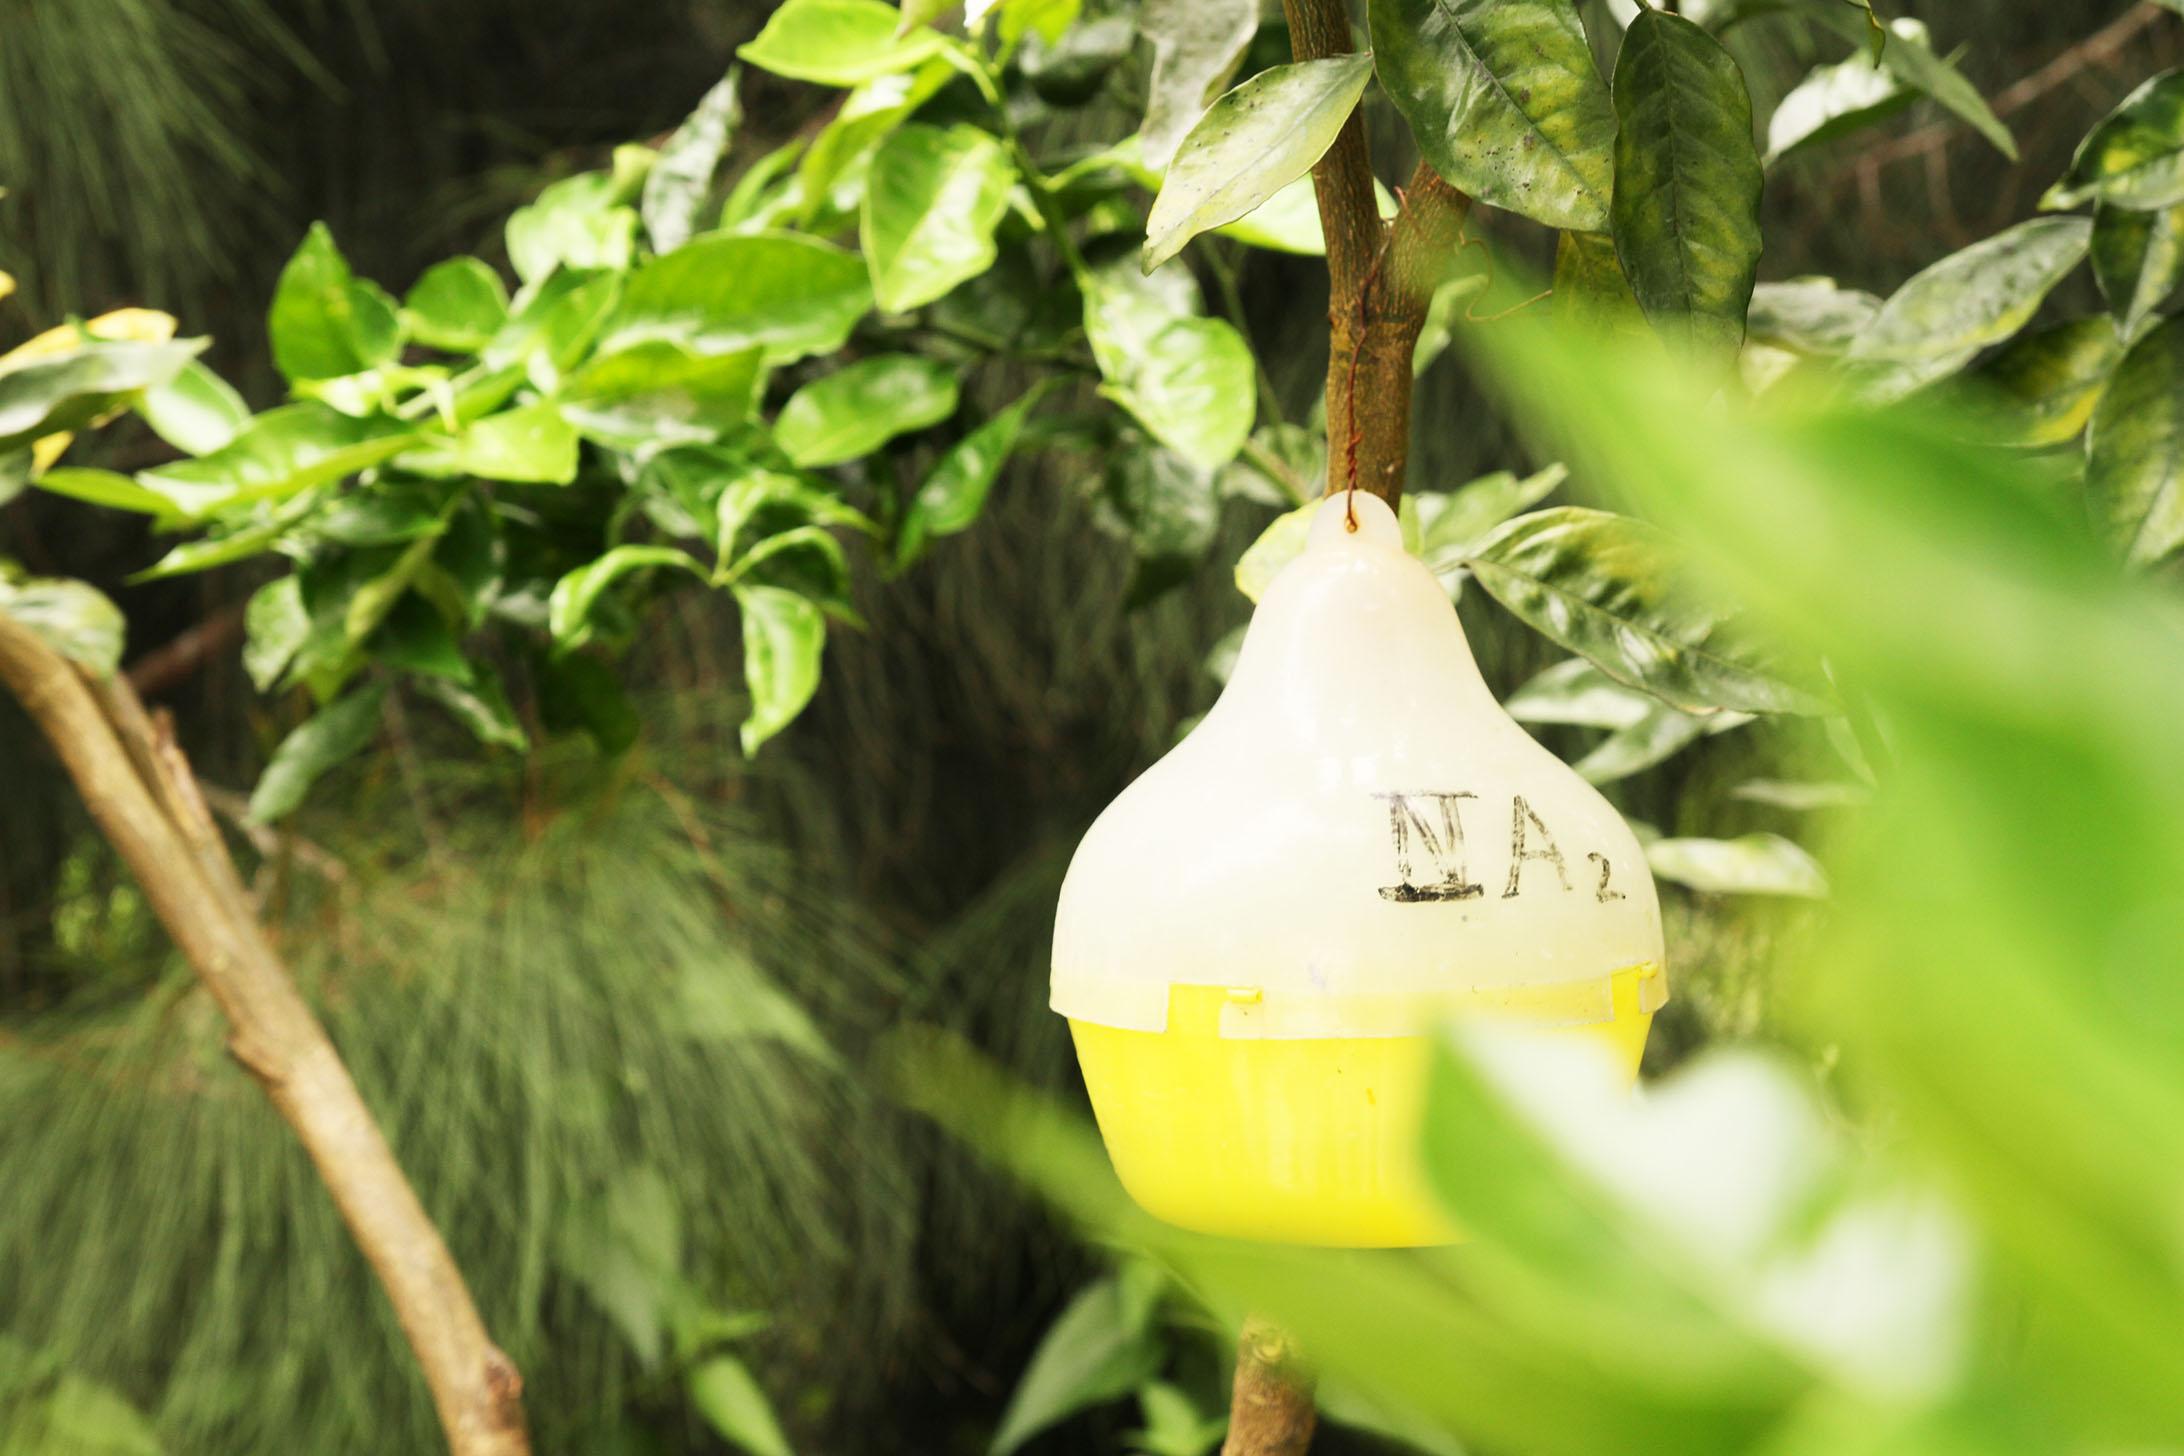 Fruitfly management in citrus